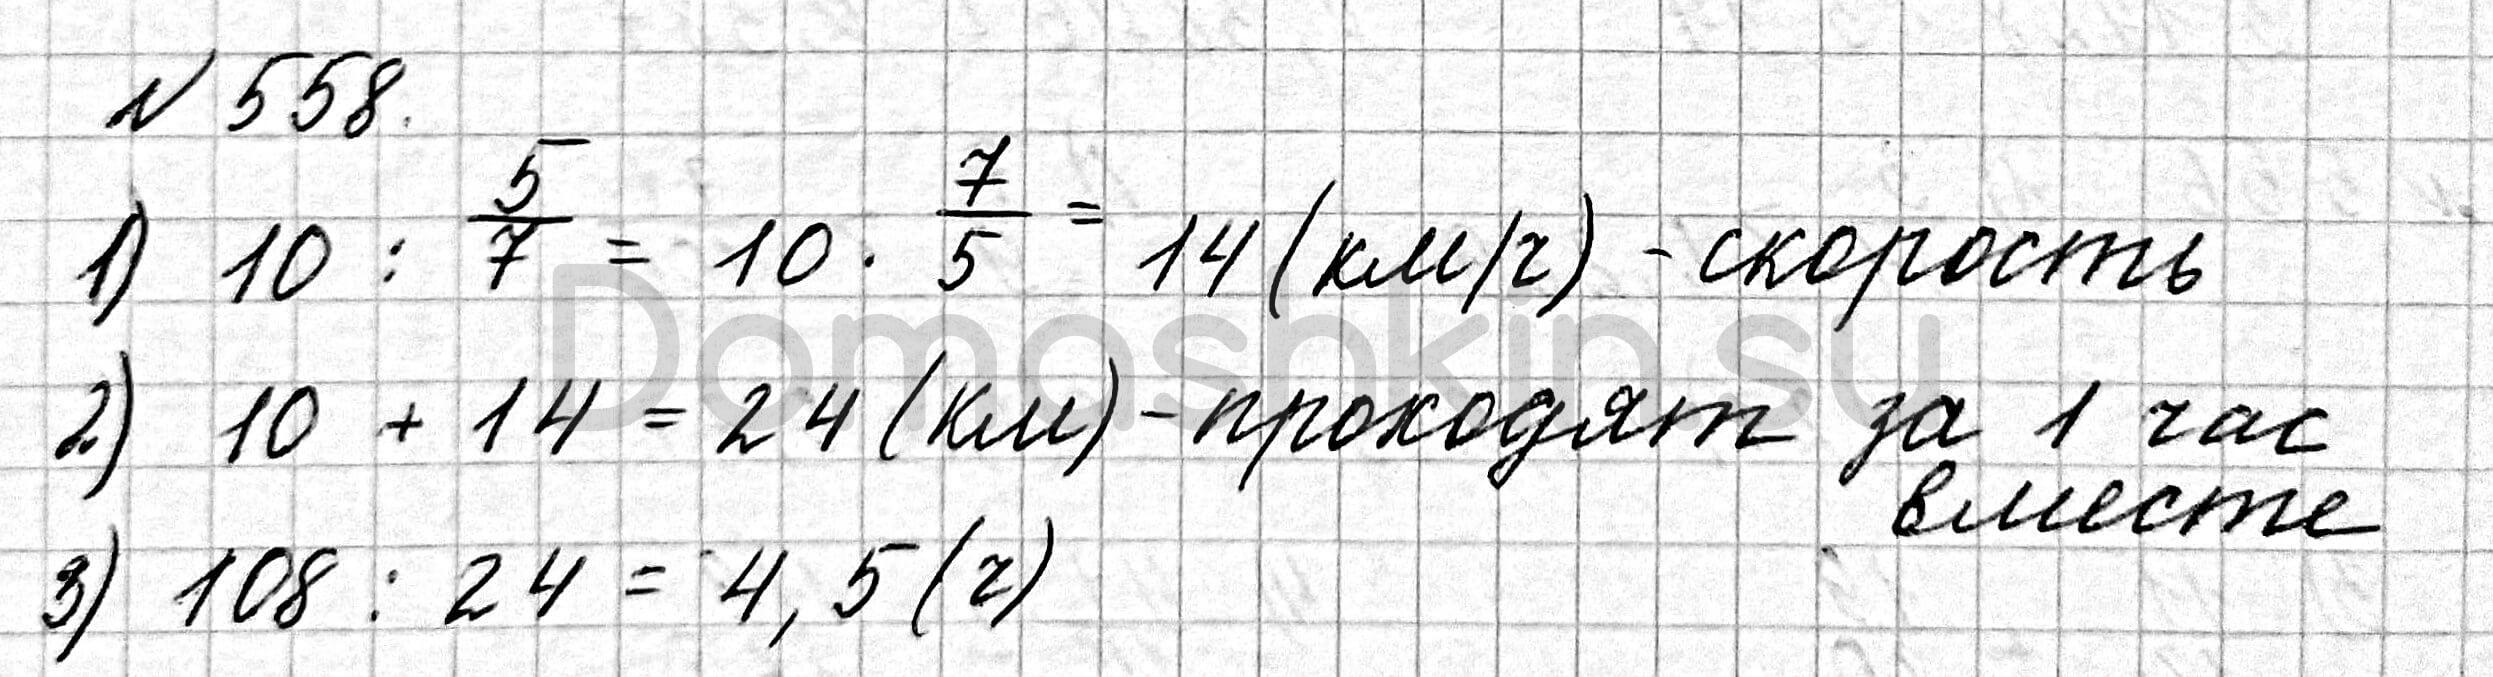 Математика 6 класс учебник Мерзляк номер 558 решение